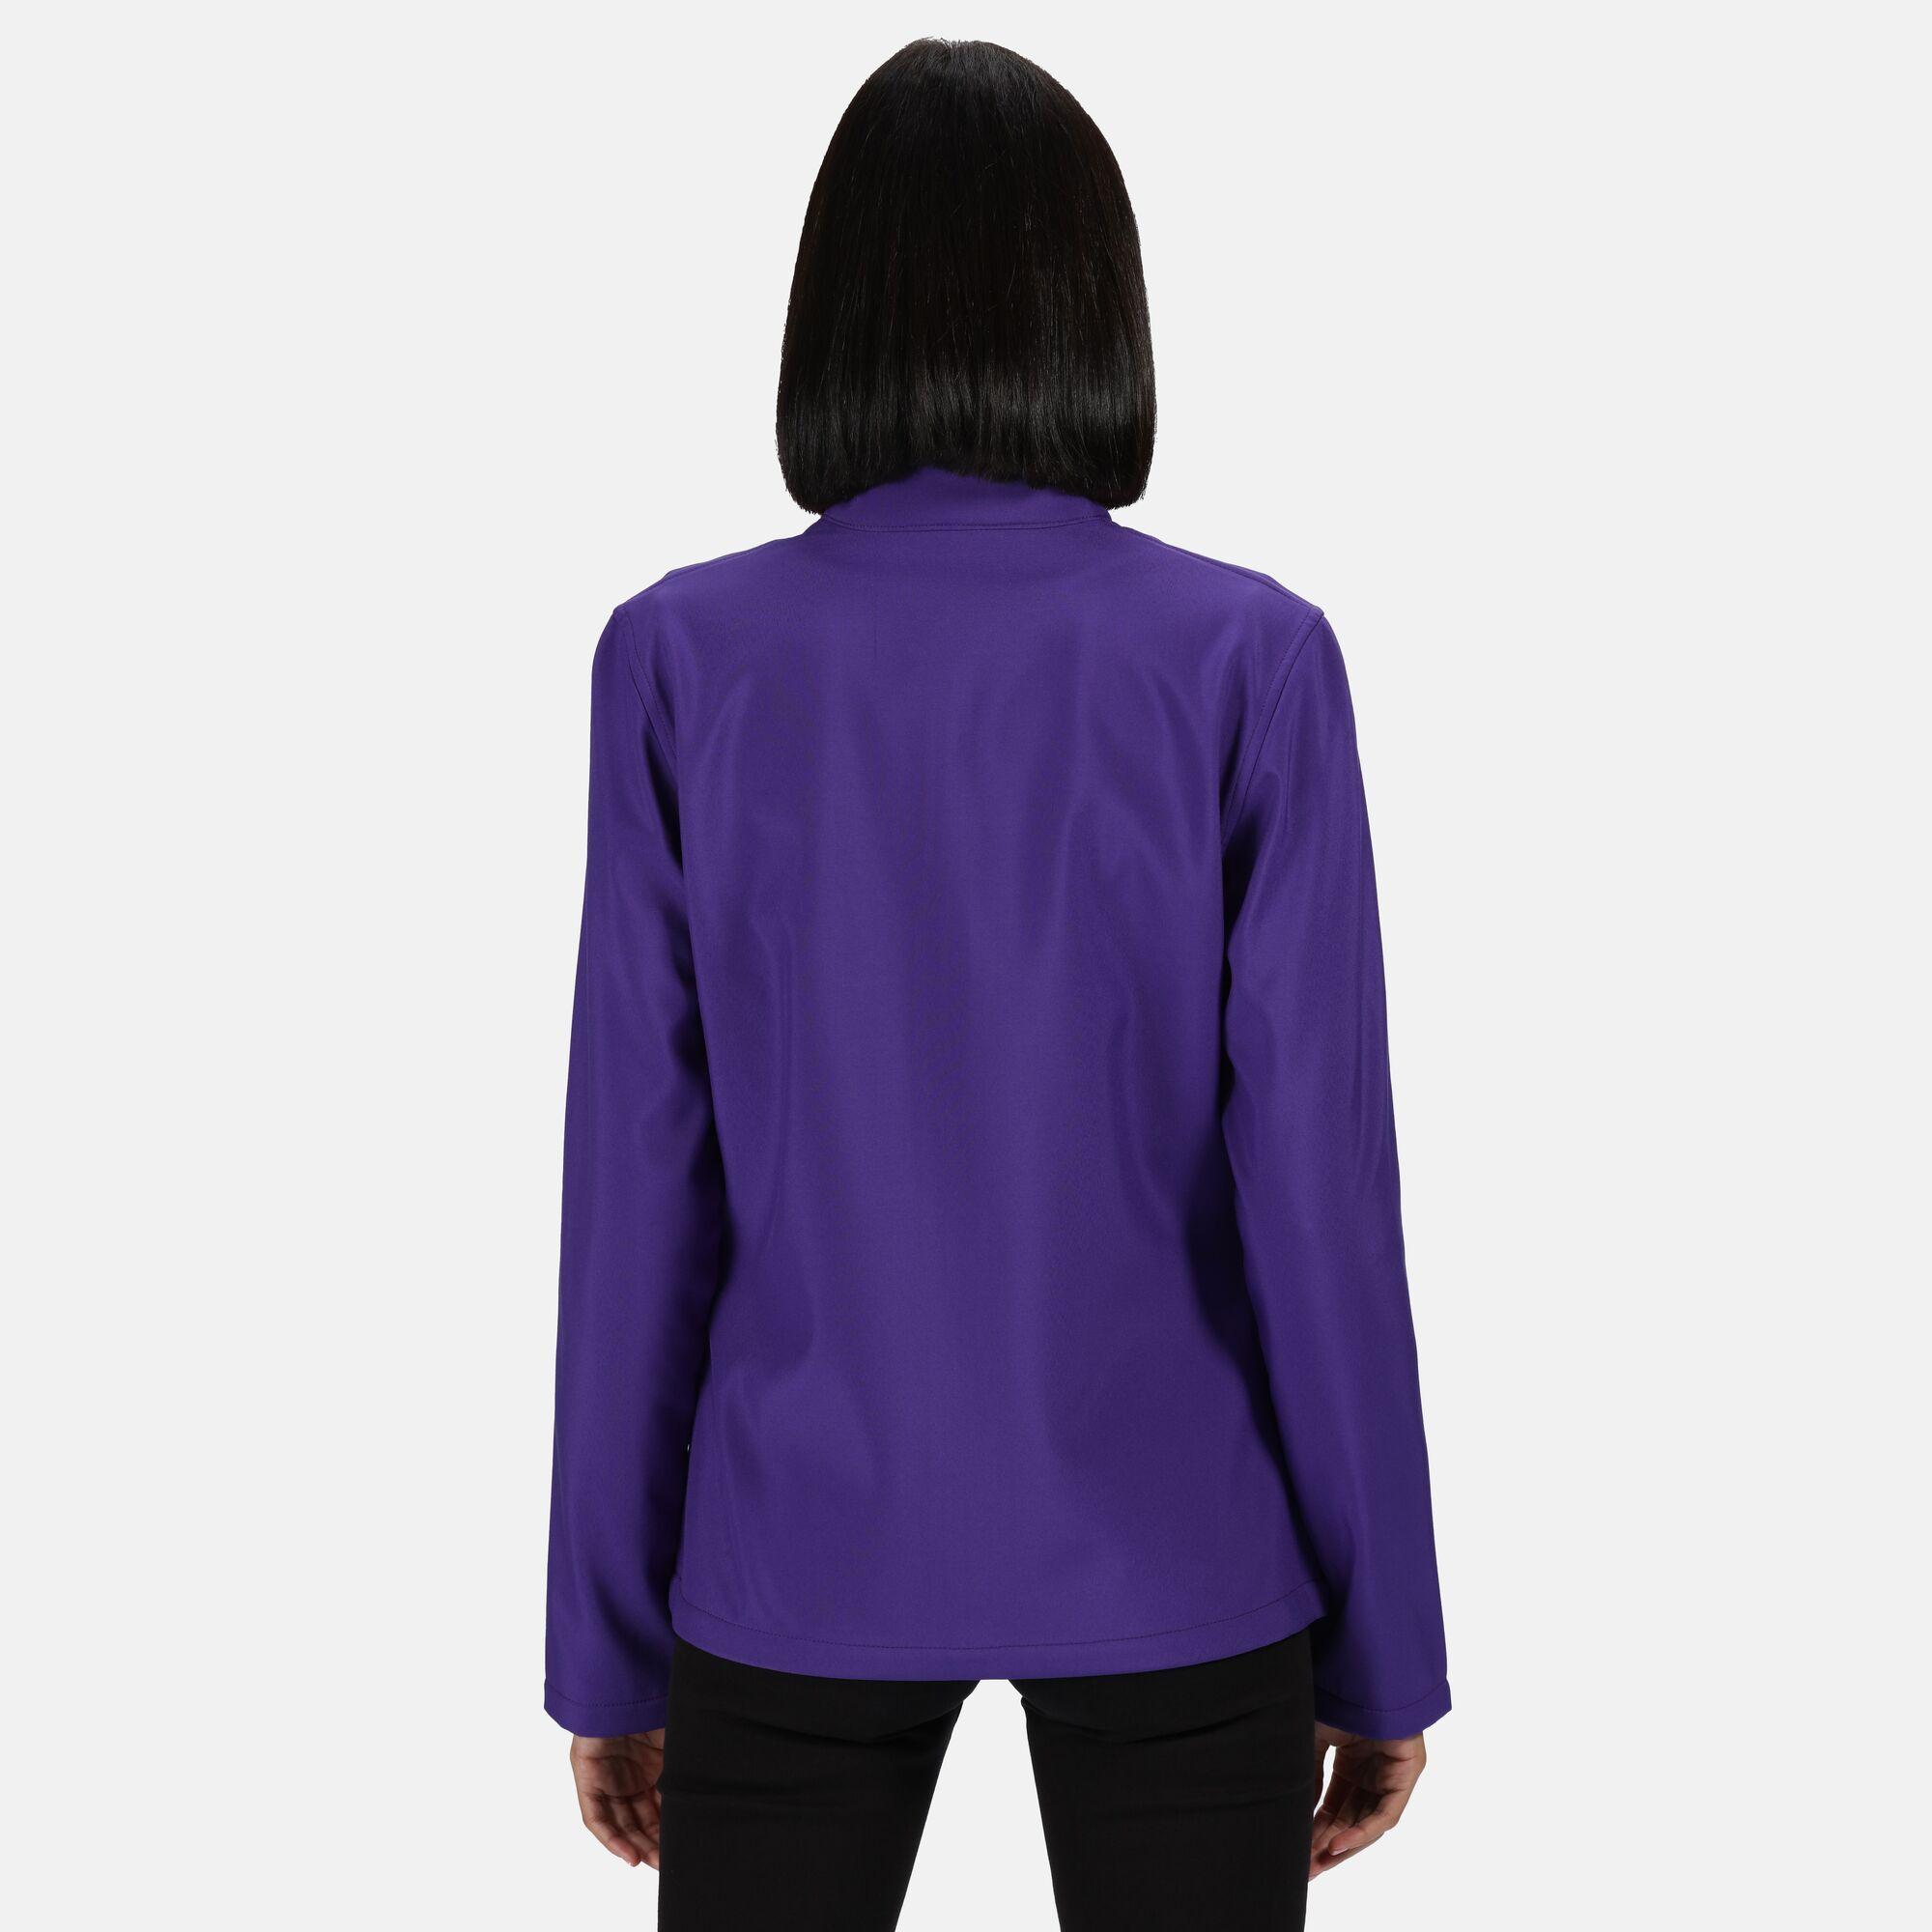 Regatta Standout Womens/Ladies Ablaze Printable Soft Shell Jacket (14) (Extreme Green/Black)